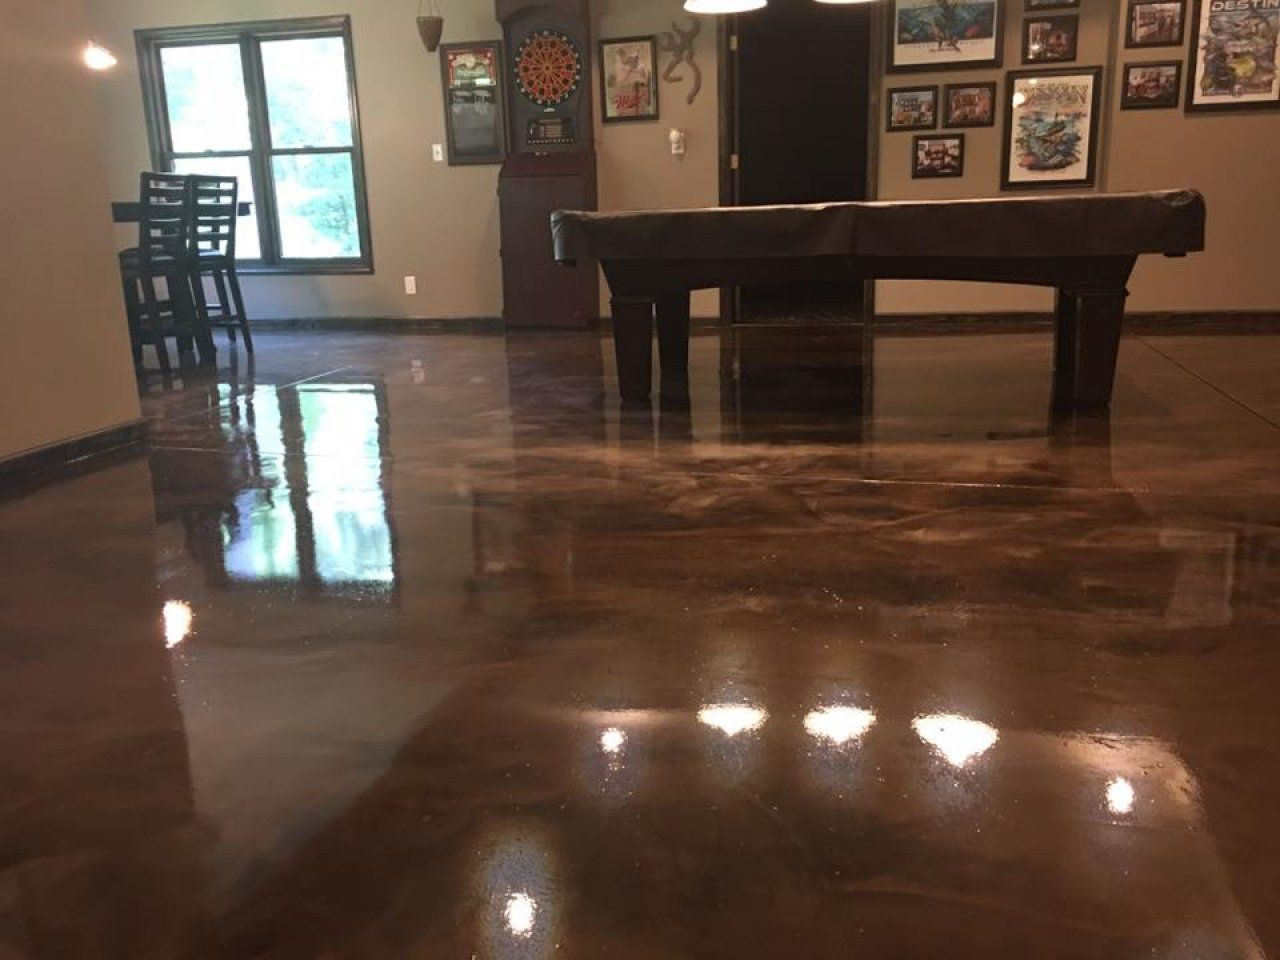 Smooth But Slip Resistant Metallic Marble Epoxy Floor In Peoria Illinois Epoxy Floor Flooring Peoria